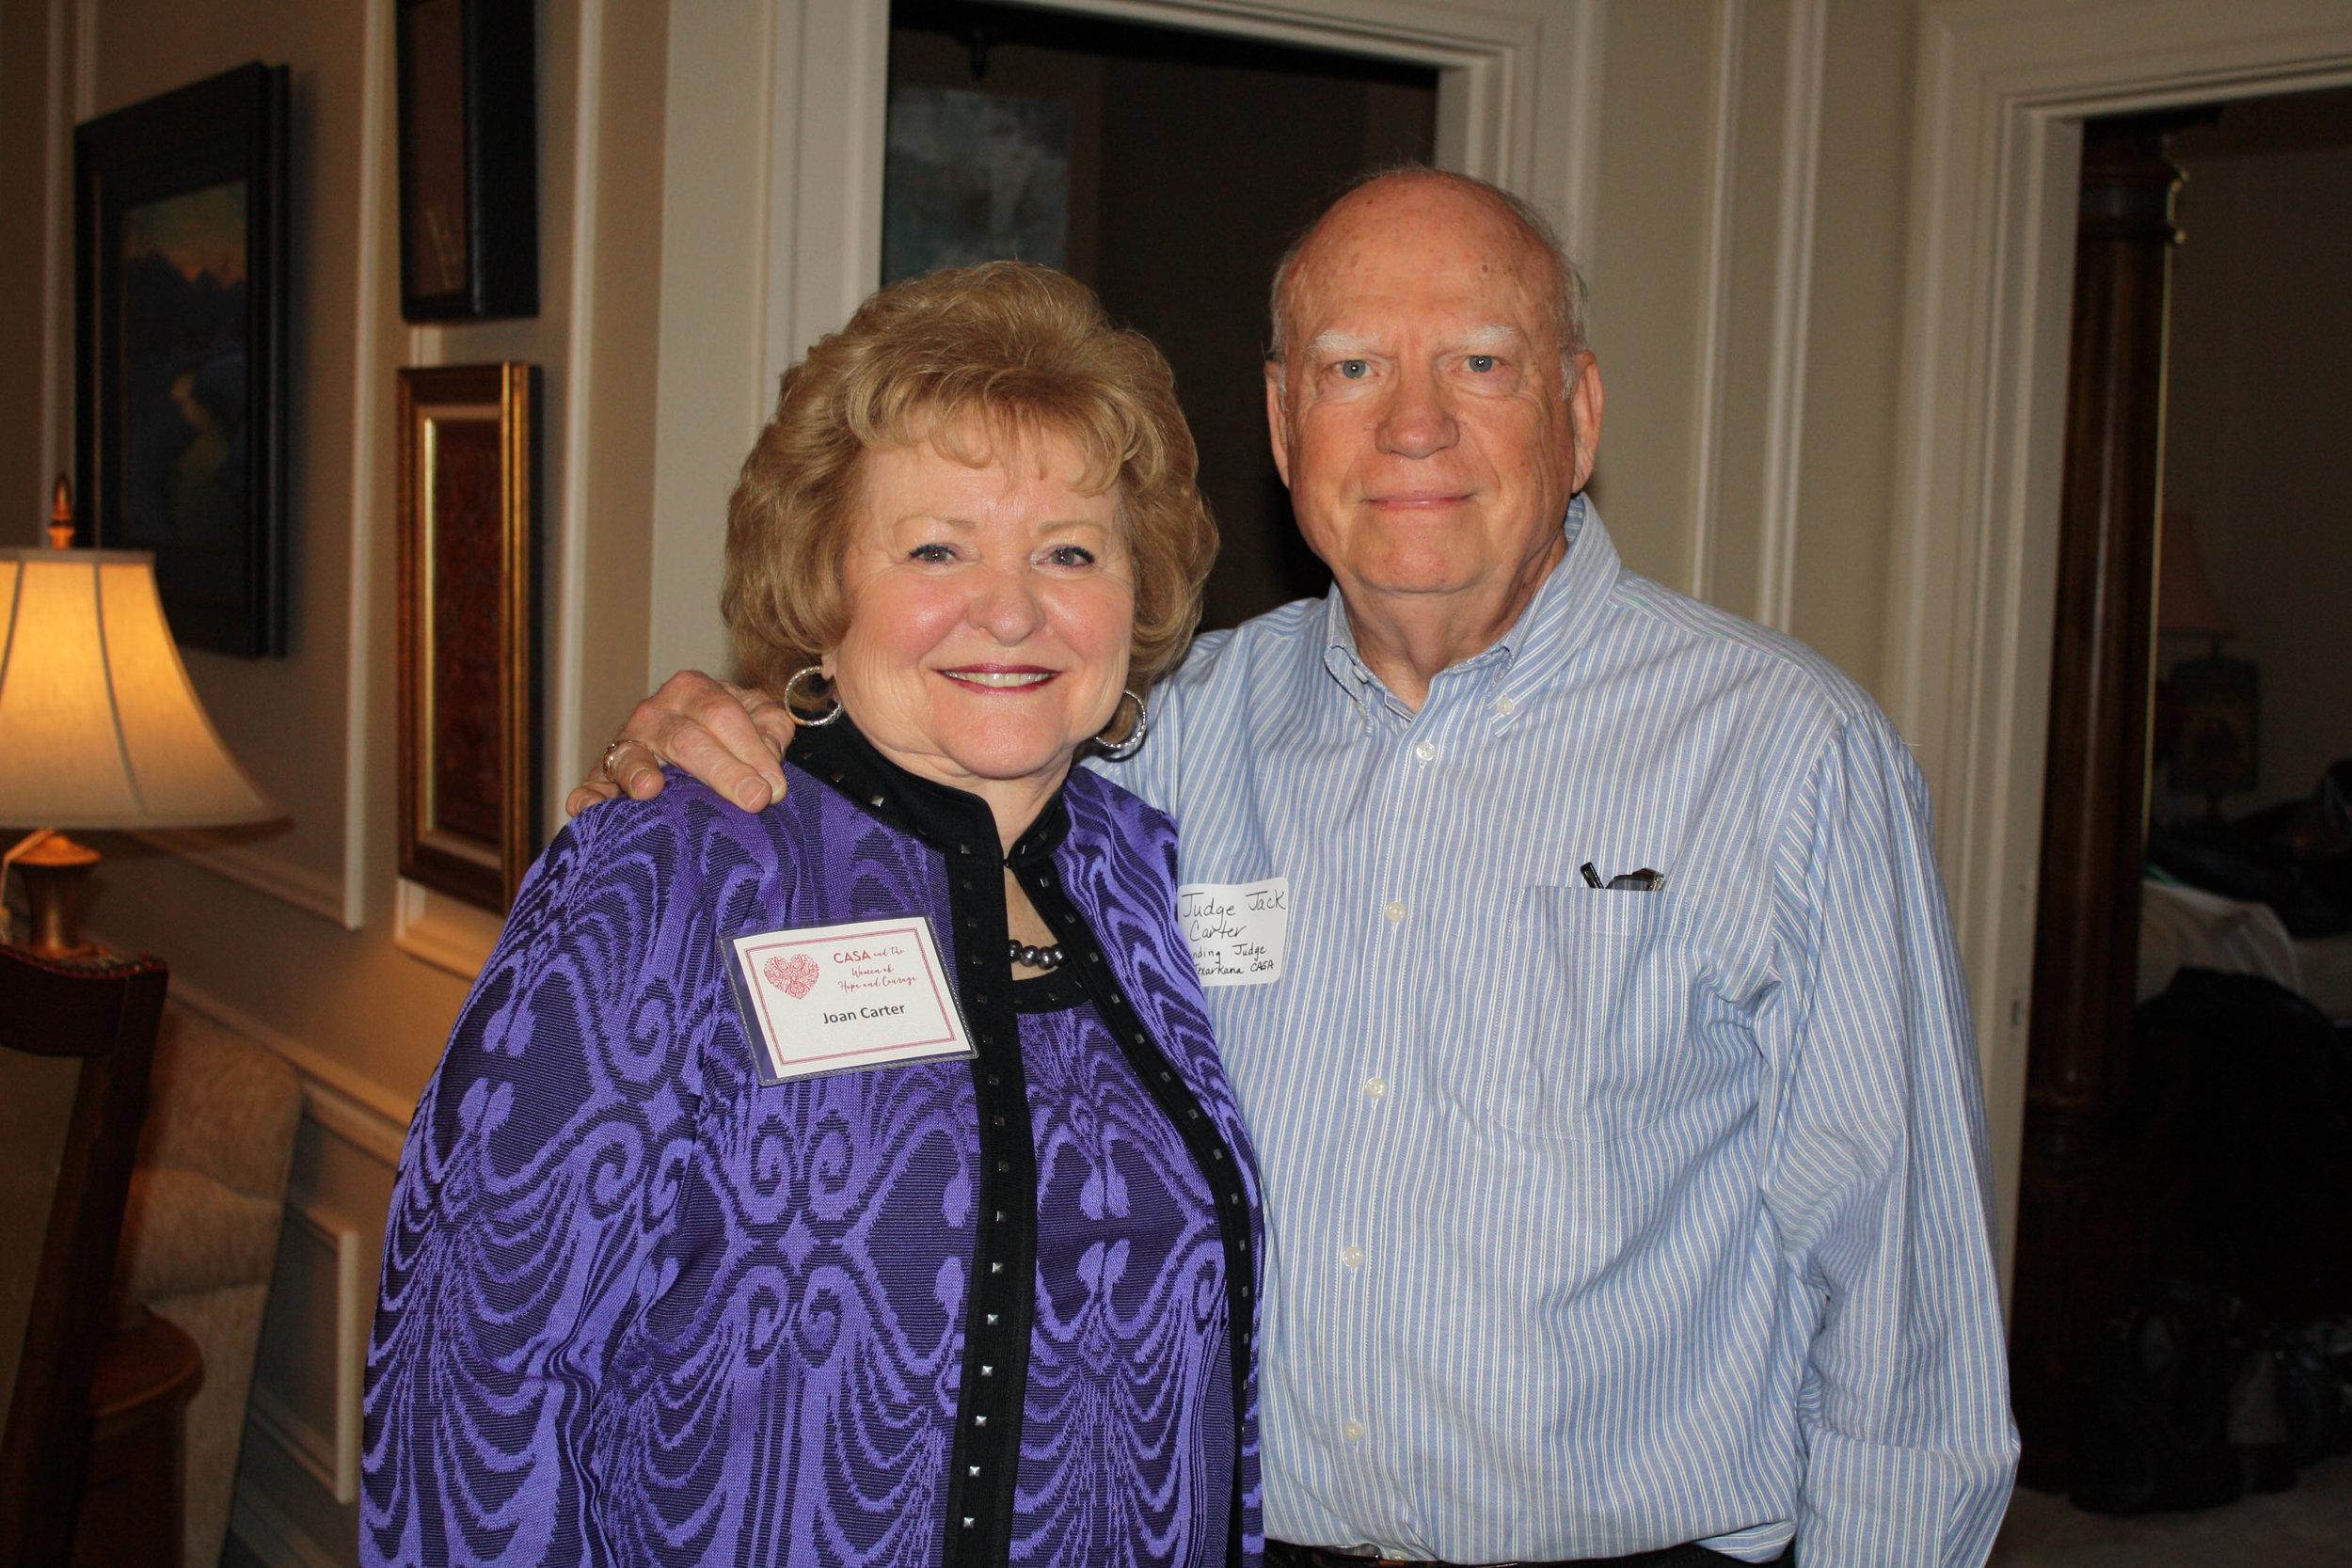 Joan and Judge Jack Carter